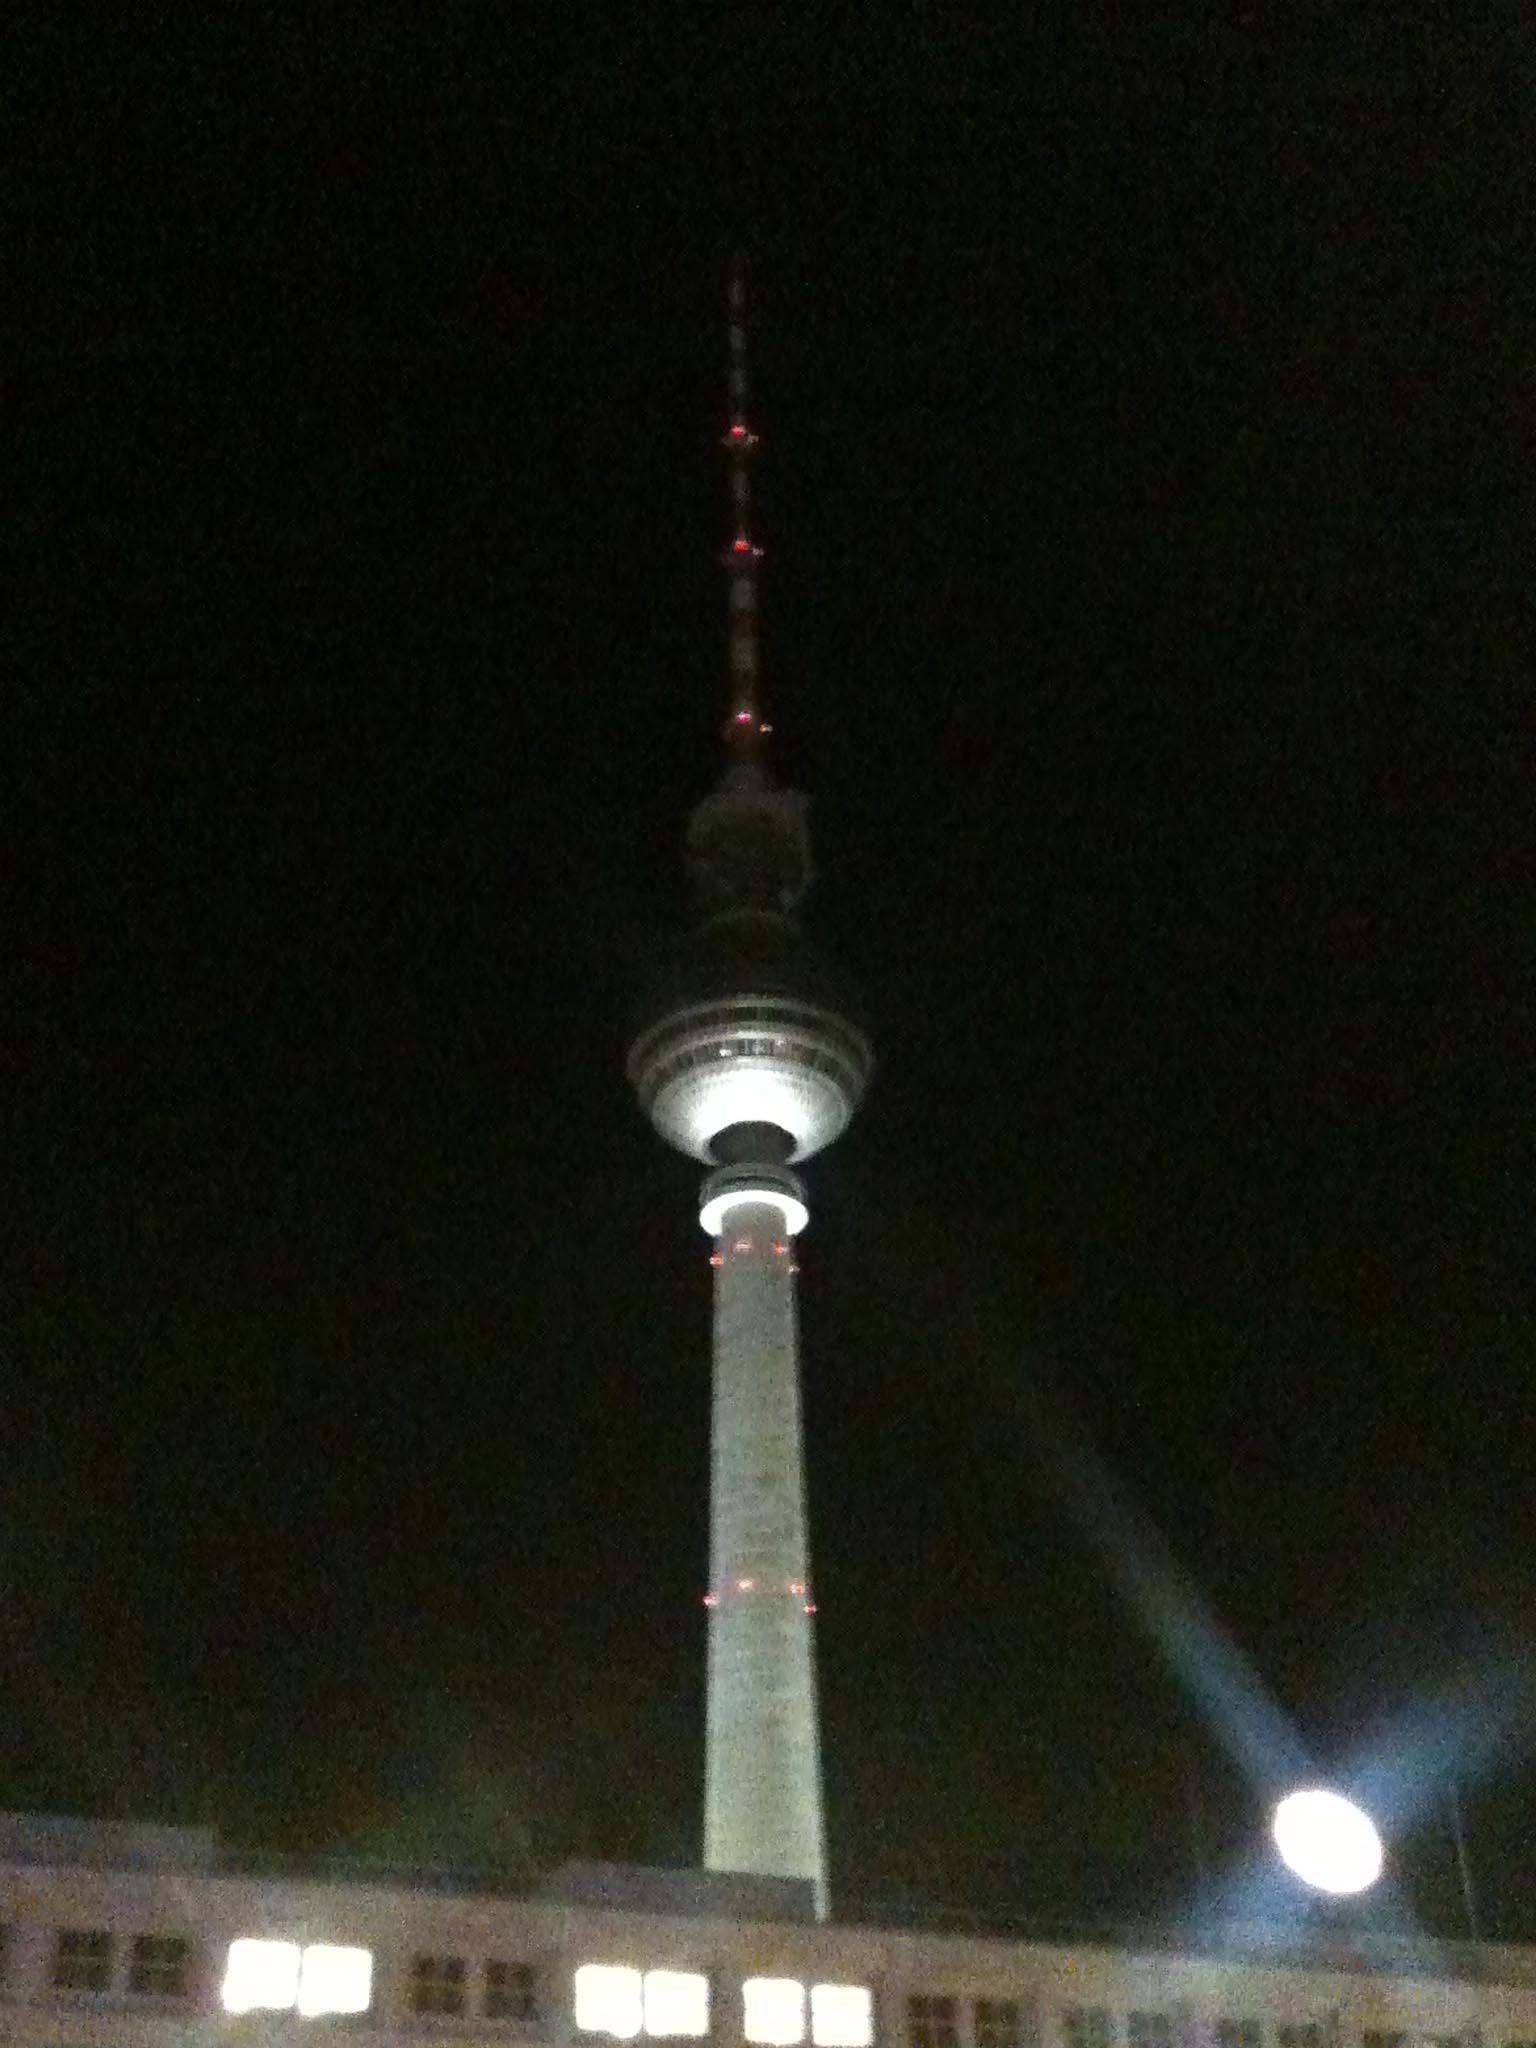 The Berlin Fernsehturm (TV Tower) at Night from Alexanderplatz